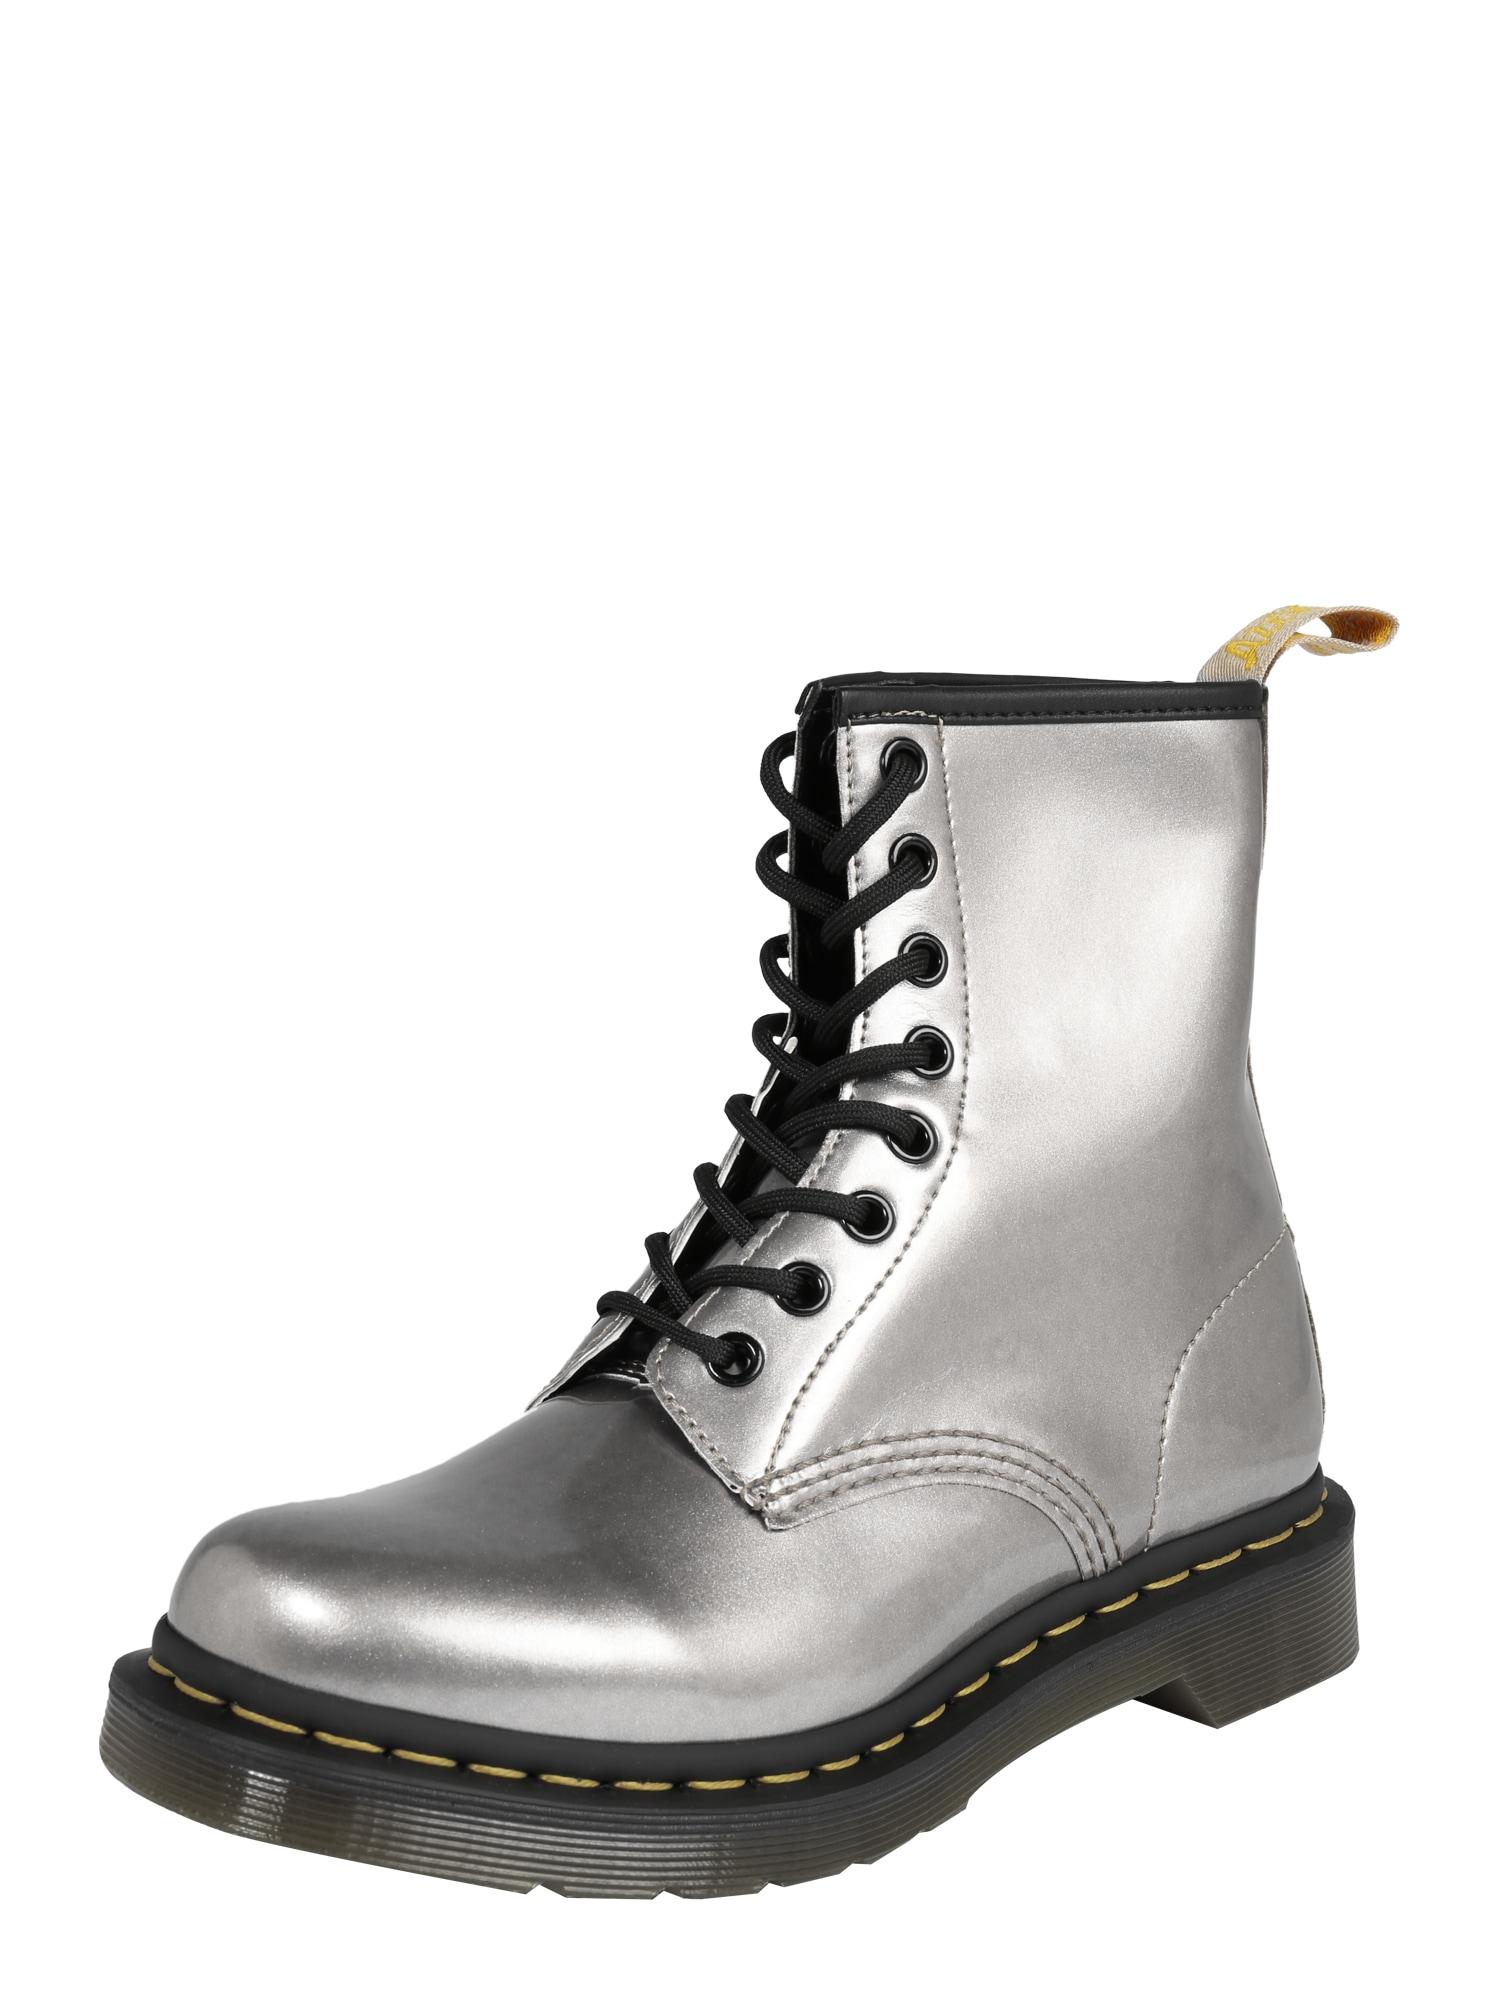 Šněrovací boty 8 Eye Boot 1460 Vegan stříbrná Dr. Martens